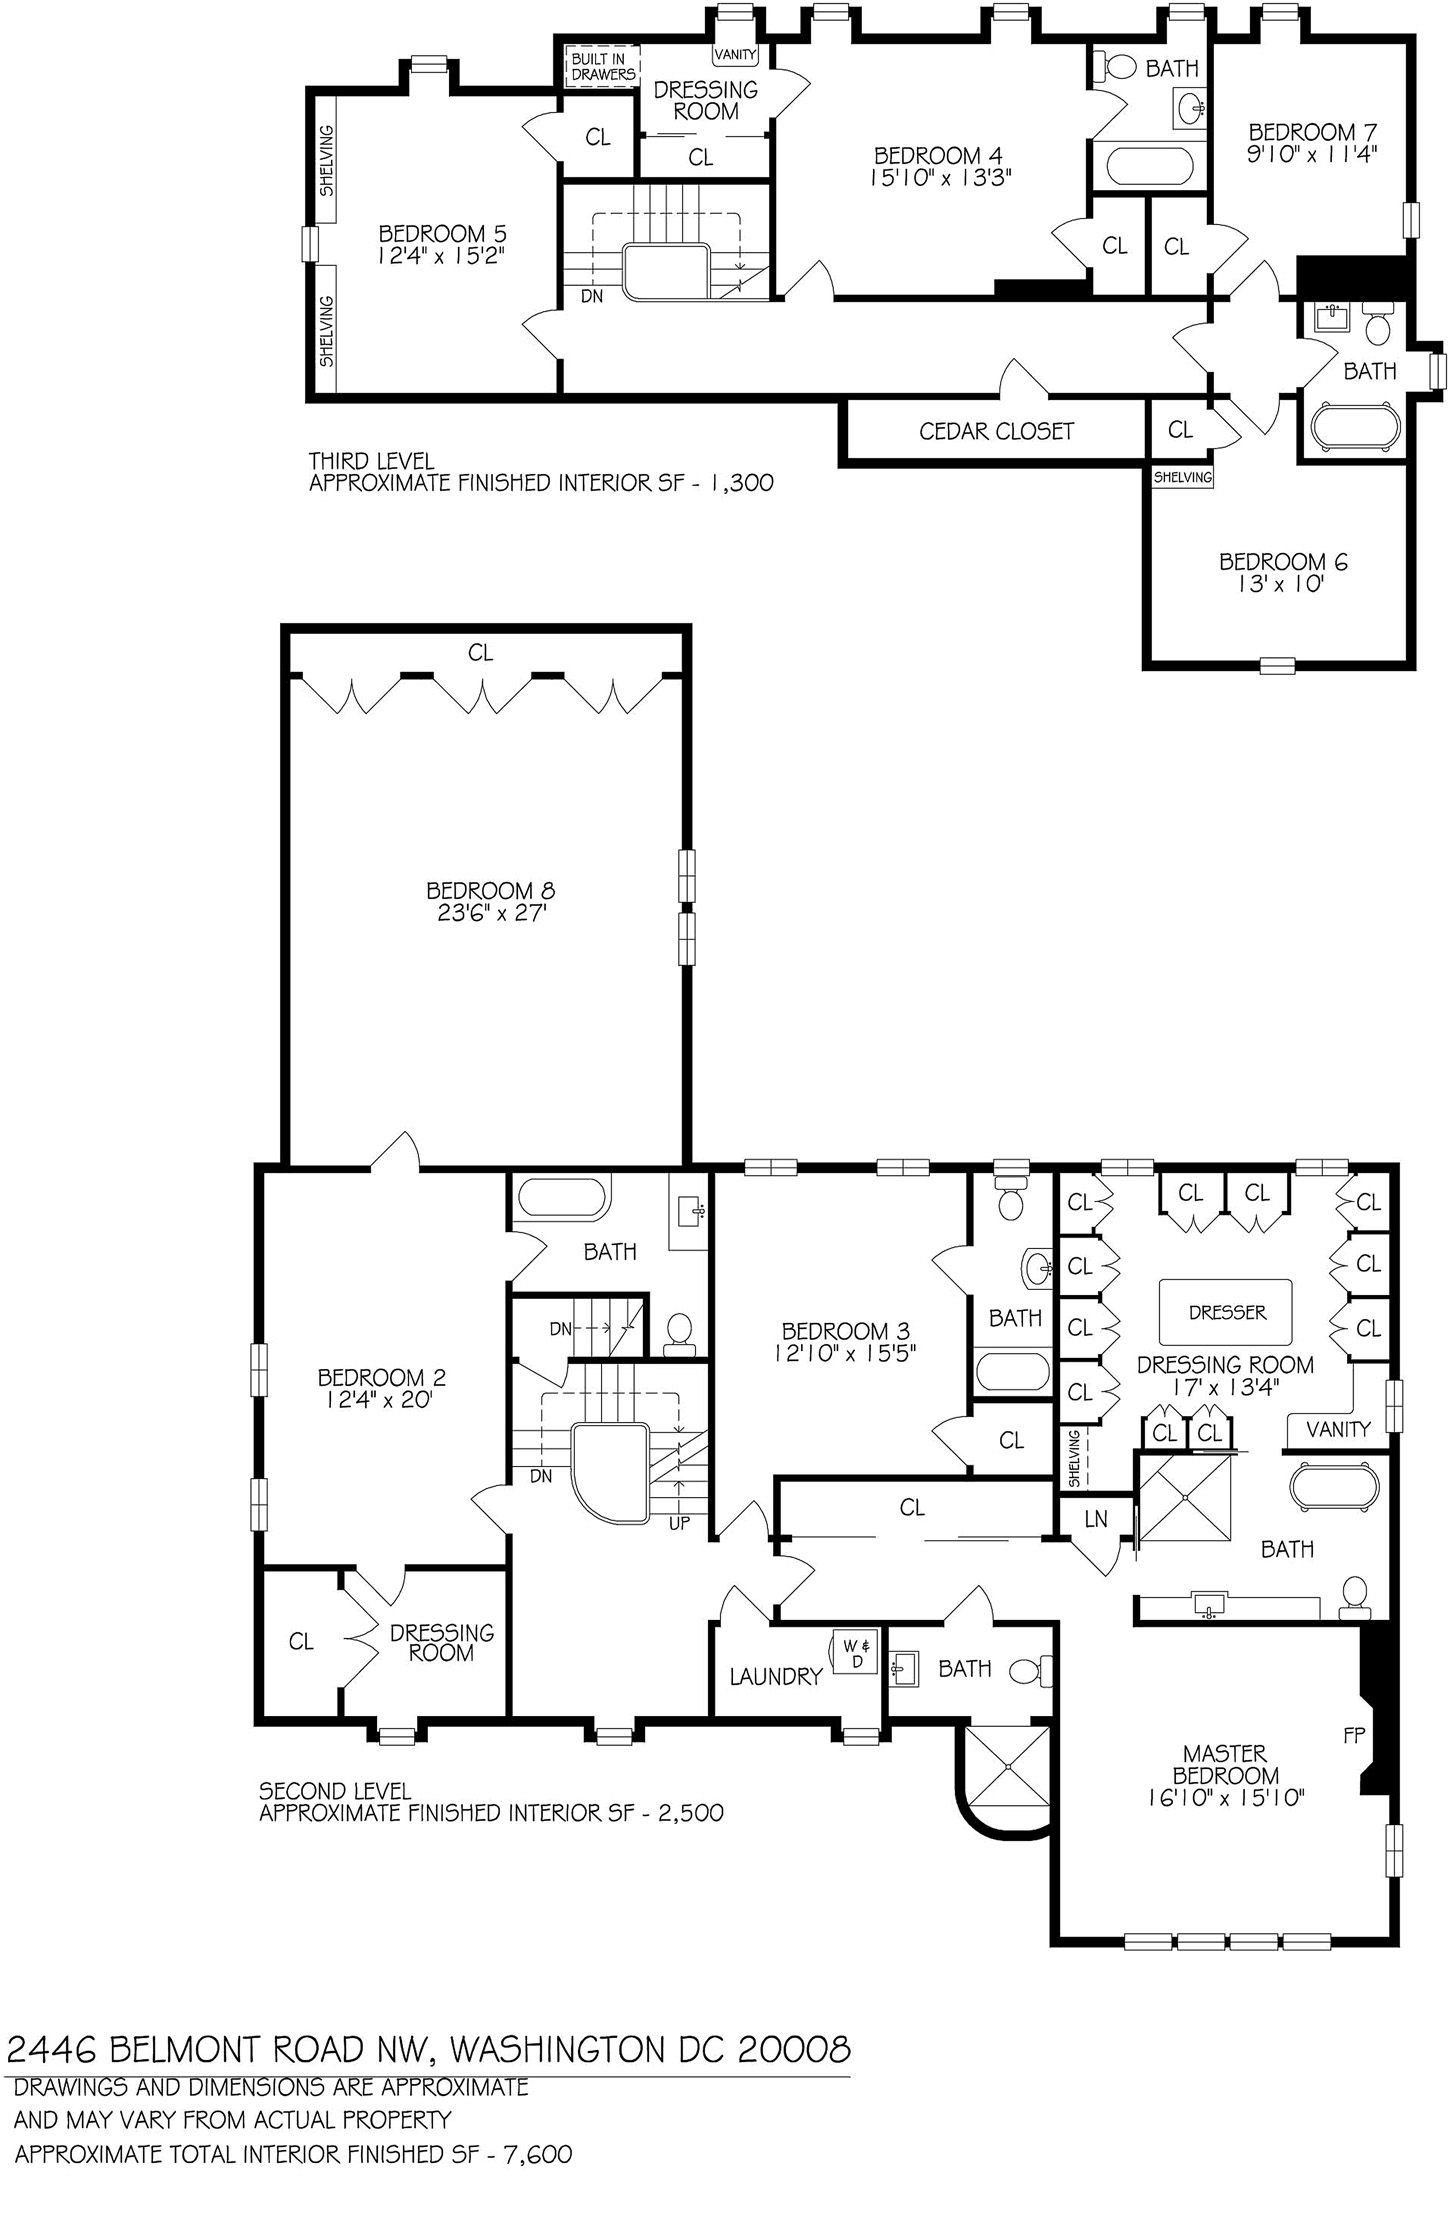 Mark mcfadden presents 2446 belmont rd nw washington dc for Washington house plans